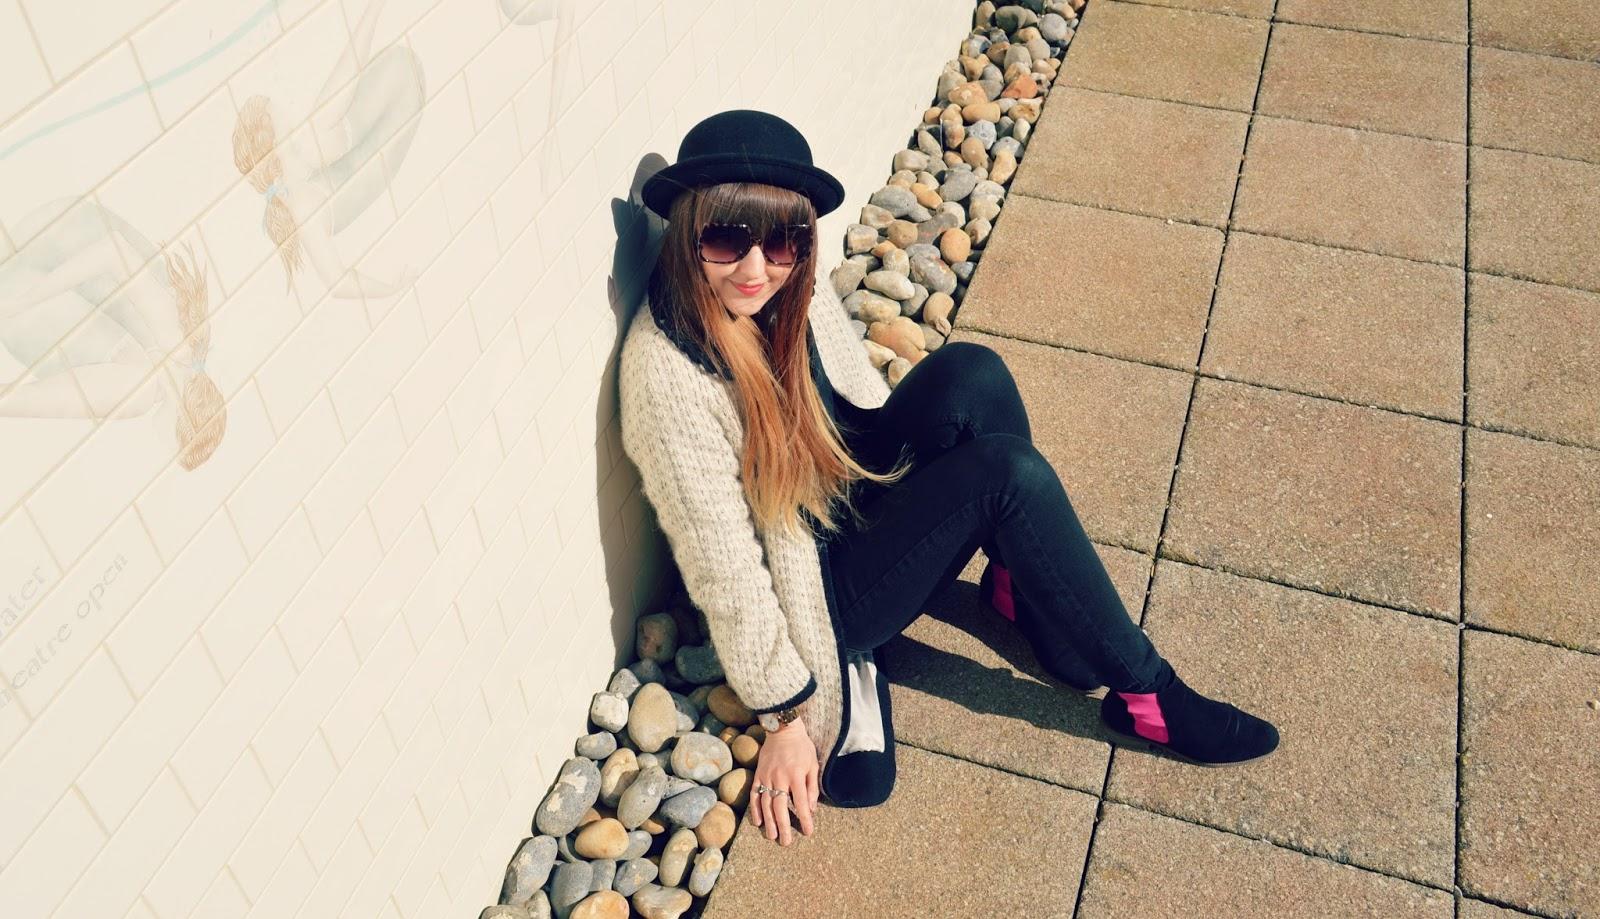 topshop coat, chelsea ankle boots, bowler hat